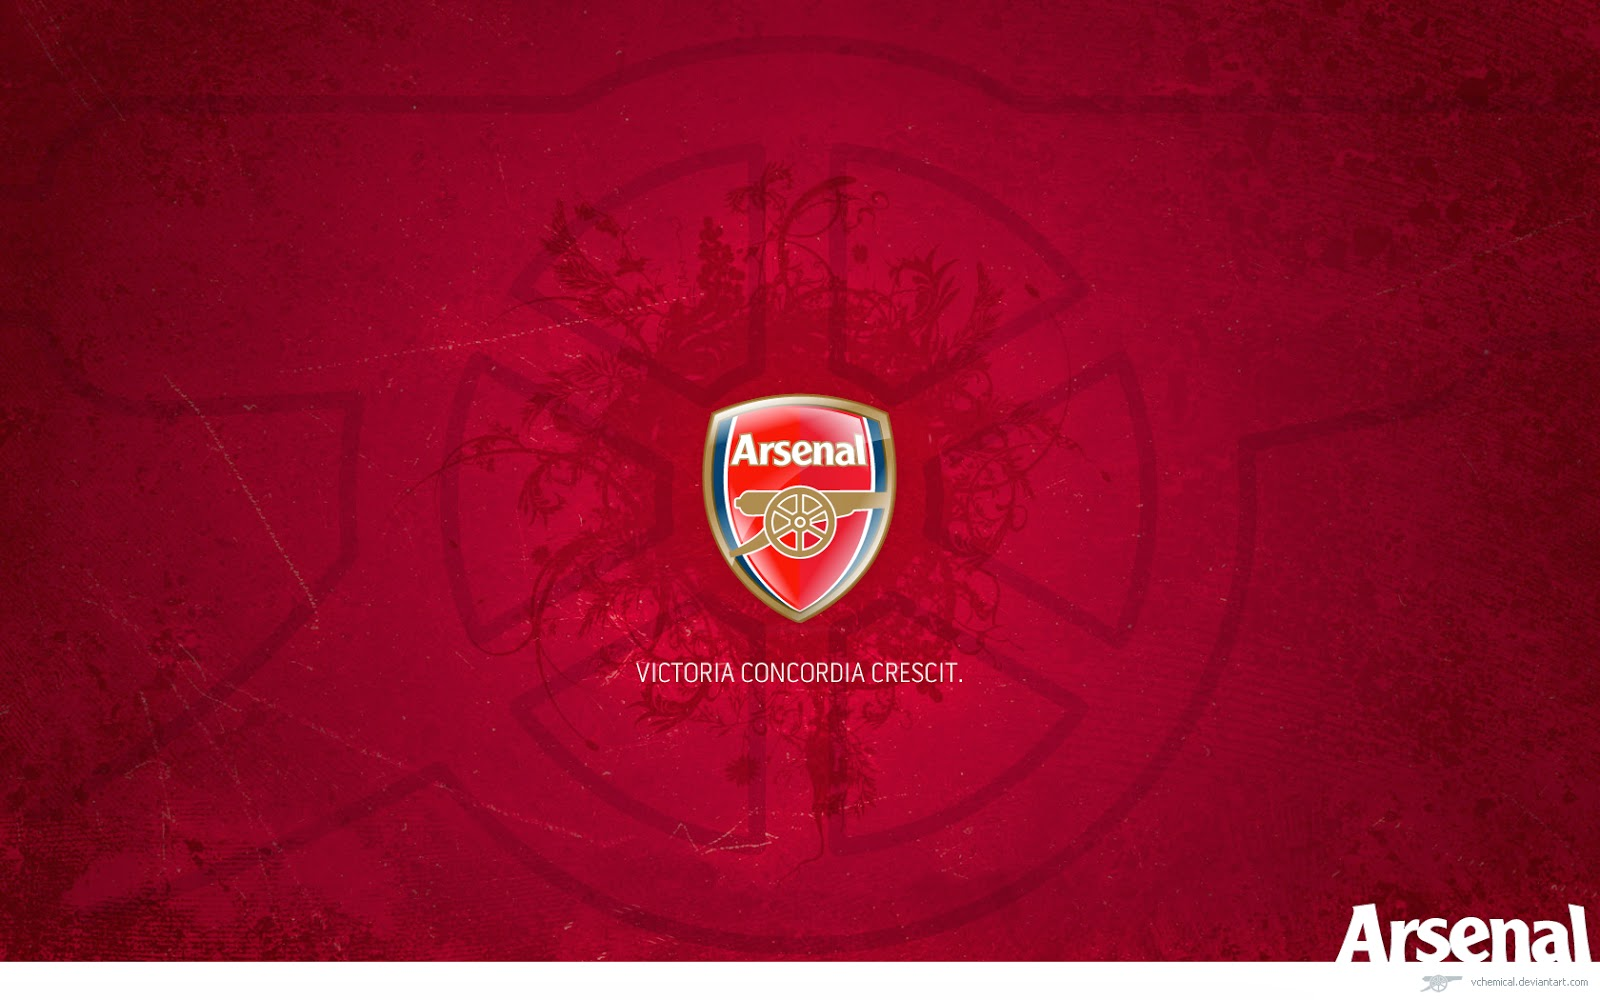 Arsenal Fc 3d Wallpapers Arsenal Wallpapers Hd Pixelstalk Net